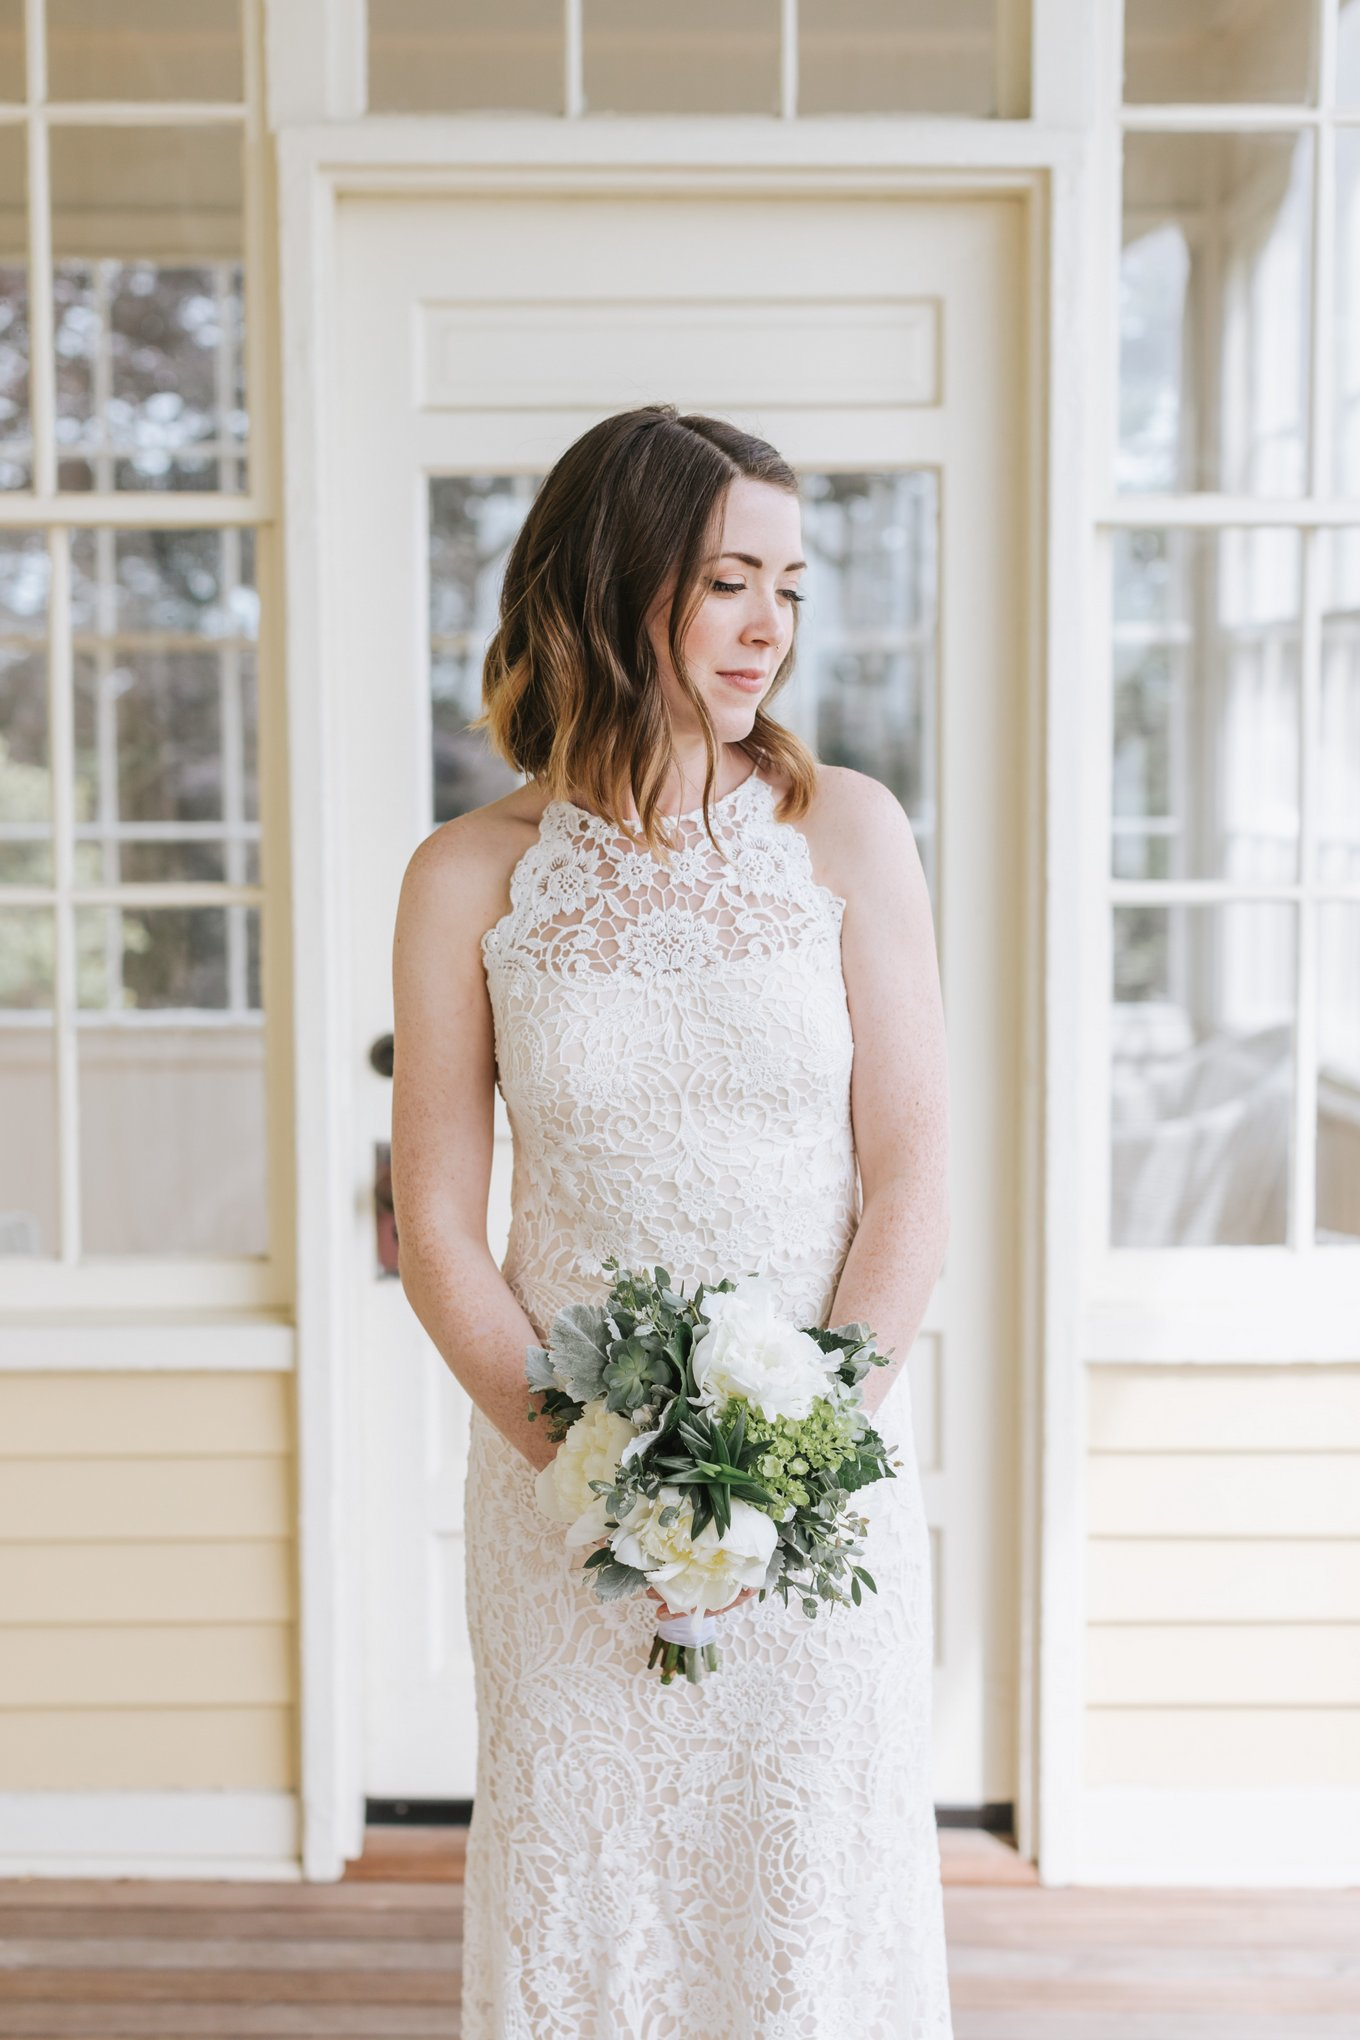 Eisenhower-House-Photographer-Newport-Wedding-16.jpg